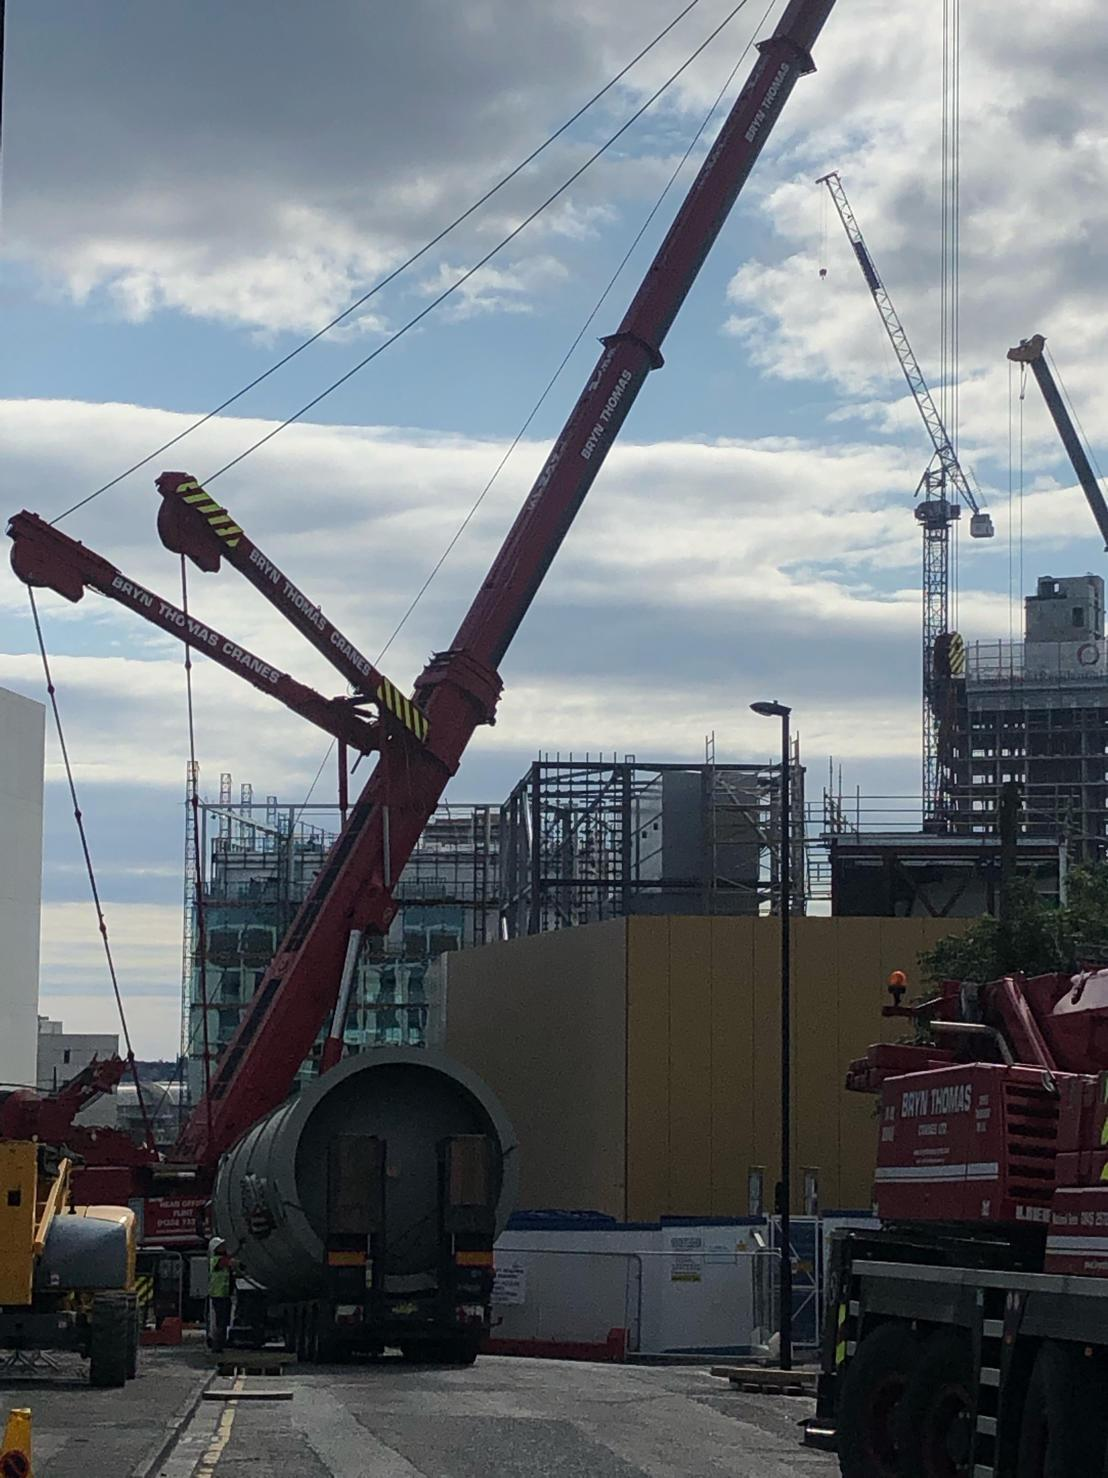 Crane Hire Newcastle & Mobile Crane Hire in Newcastle Upon Tyne